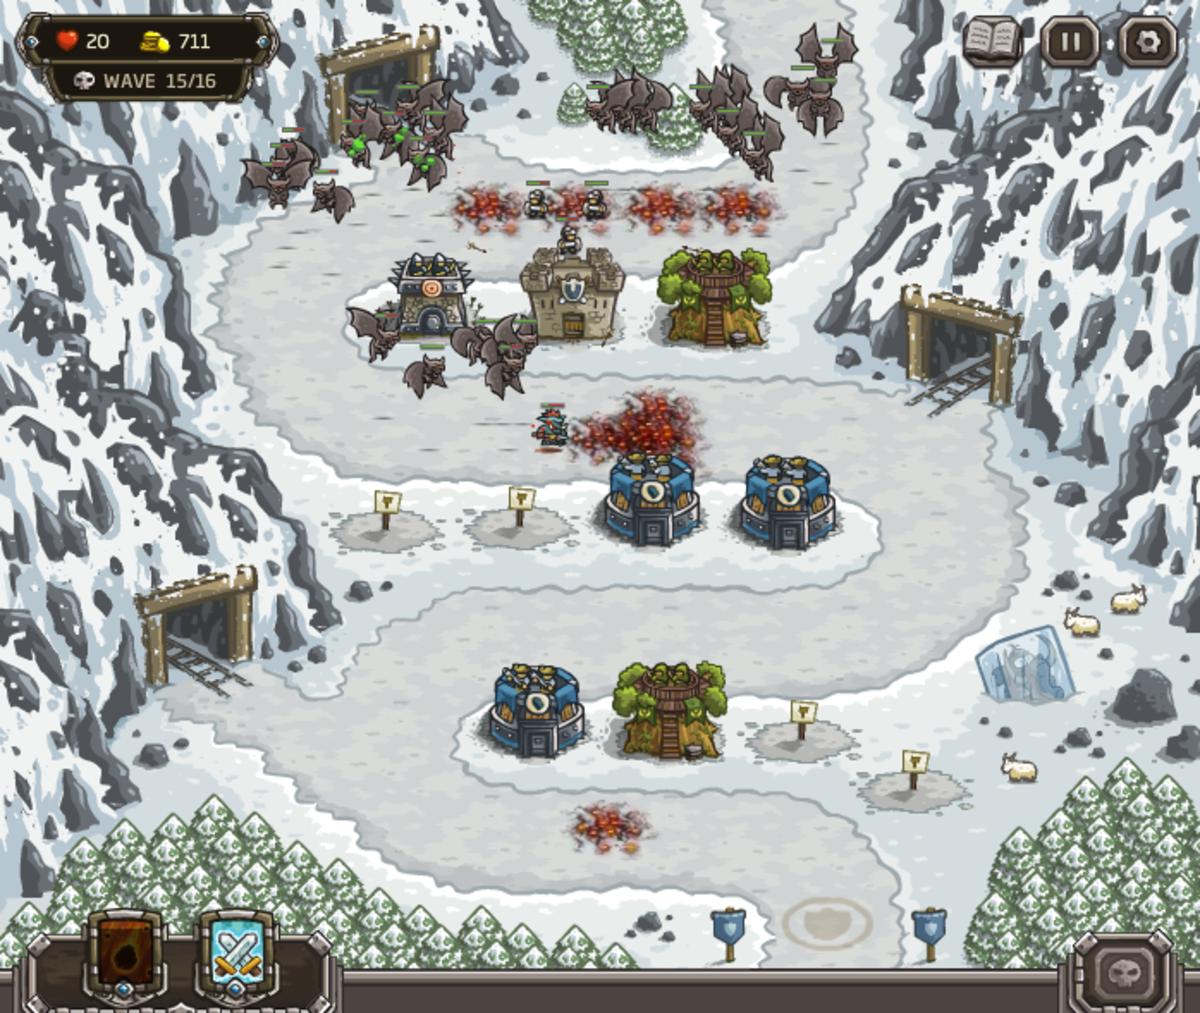 Kingdom Rush Walkthrough: Level 7 - Coldstep Mines